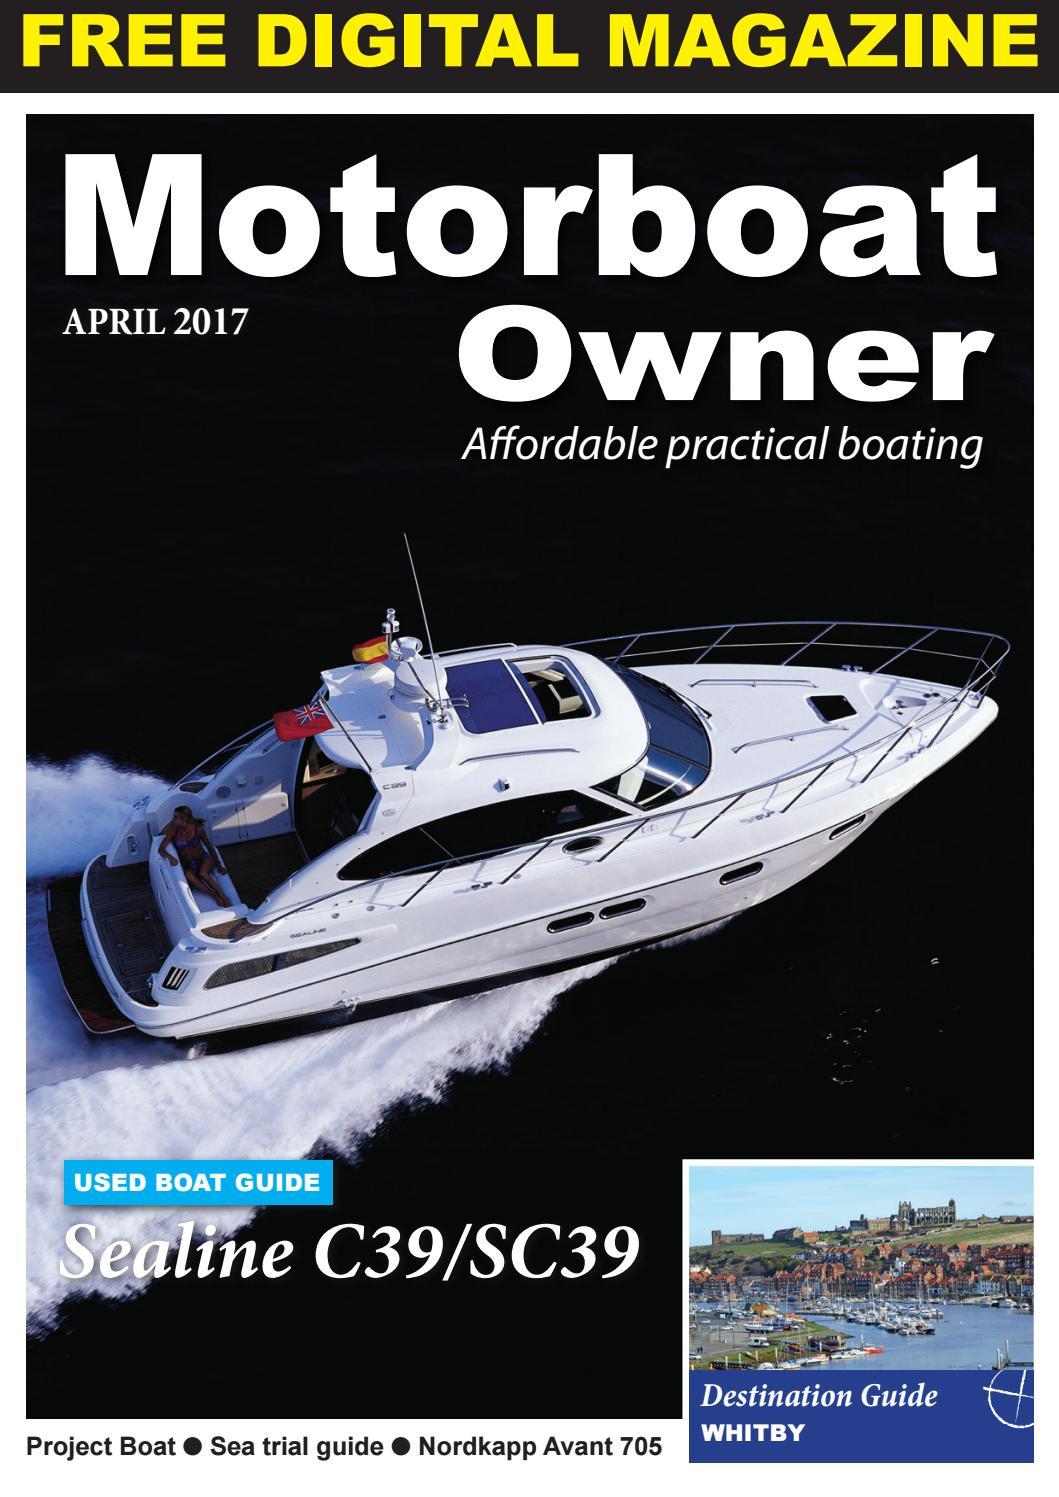 Motorboat Owner April 2017 by Digital Marine Media Ltd - issuu on